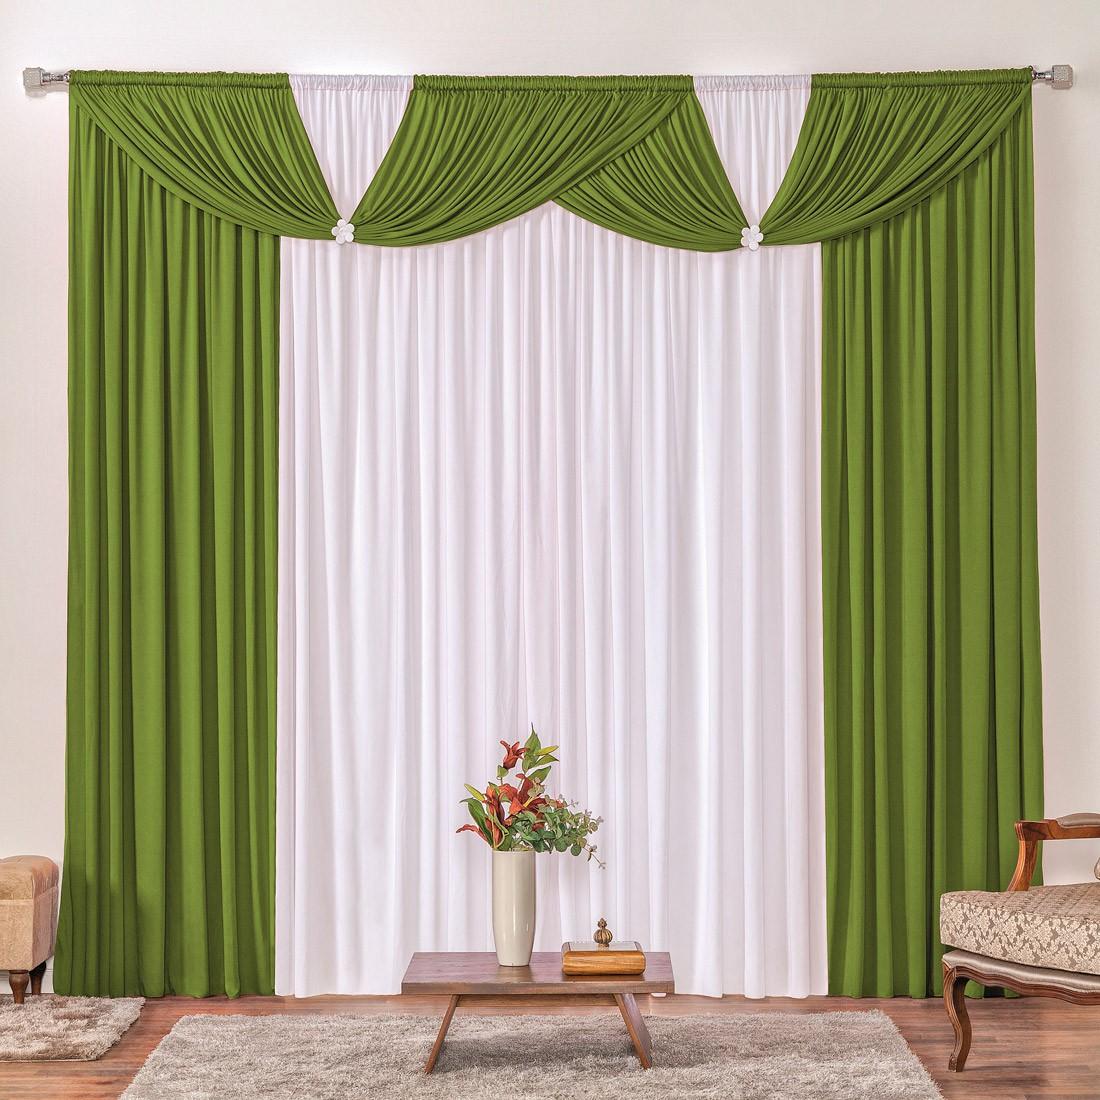 Cortina Londrina Verde/Branco 2,00m X 1,70m p/ Varão Simples